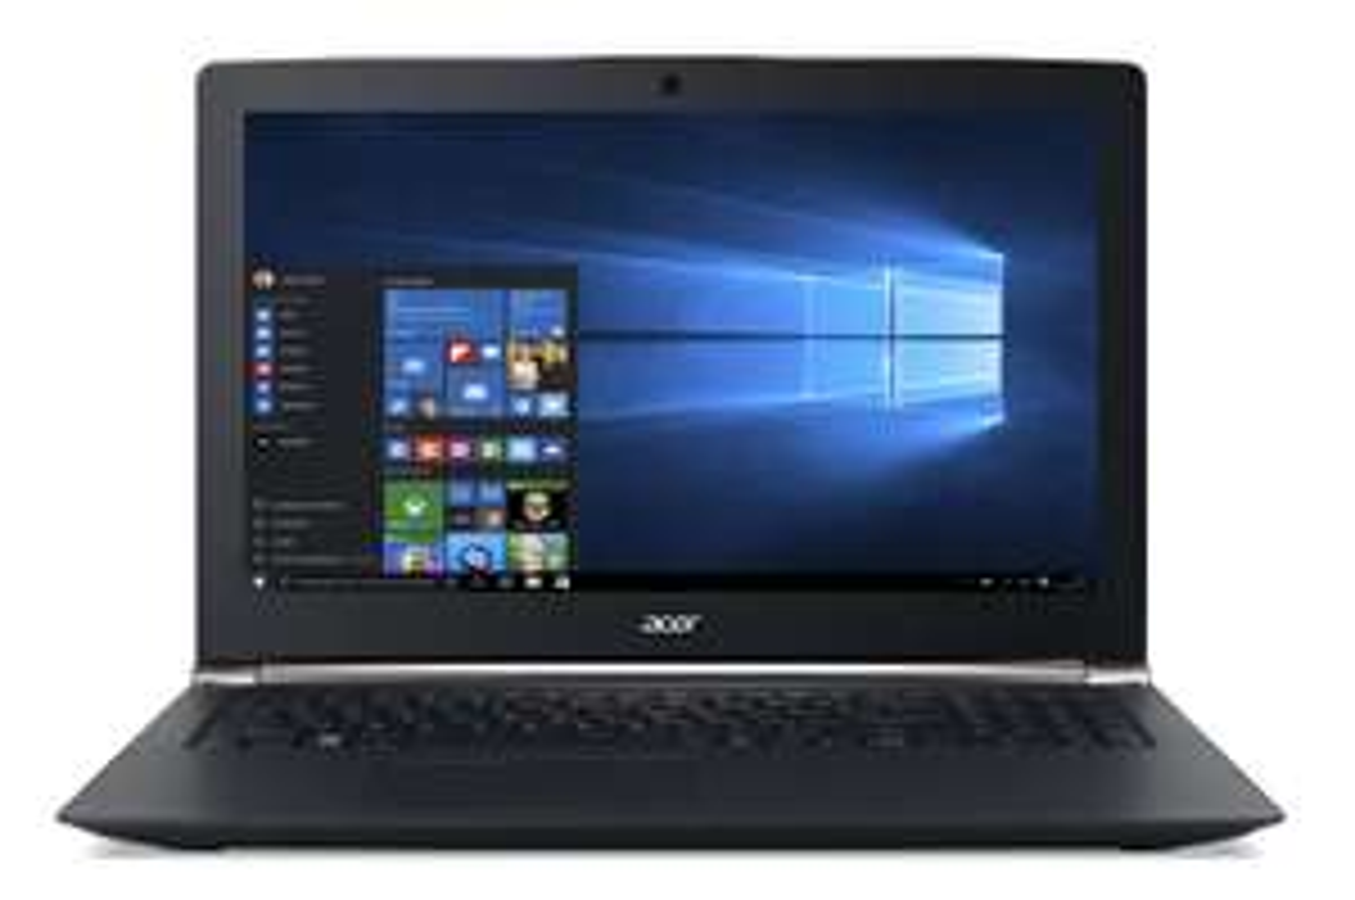 "PC Portable 15.6"" Acer Aspire VN7-592G-57NQ - Intel i5-6300HQ, 8 Go de Ram, 1 To, GeForce GTX960M, Windows 10"